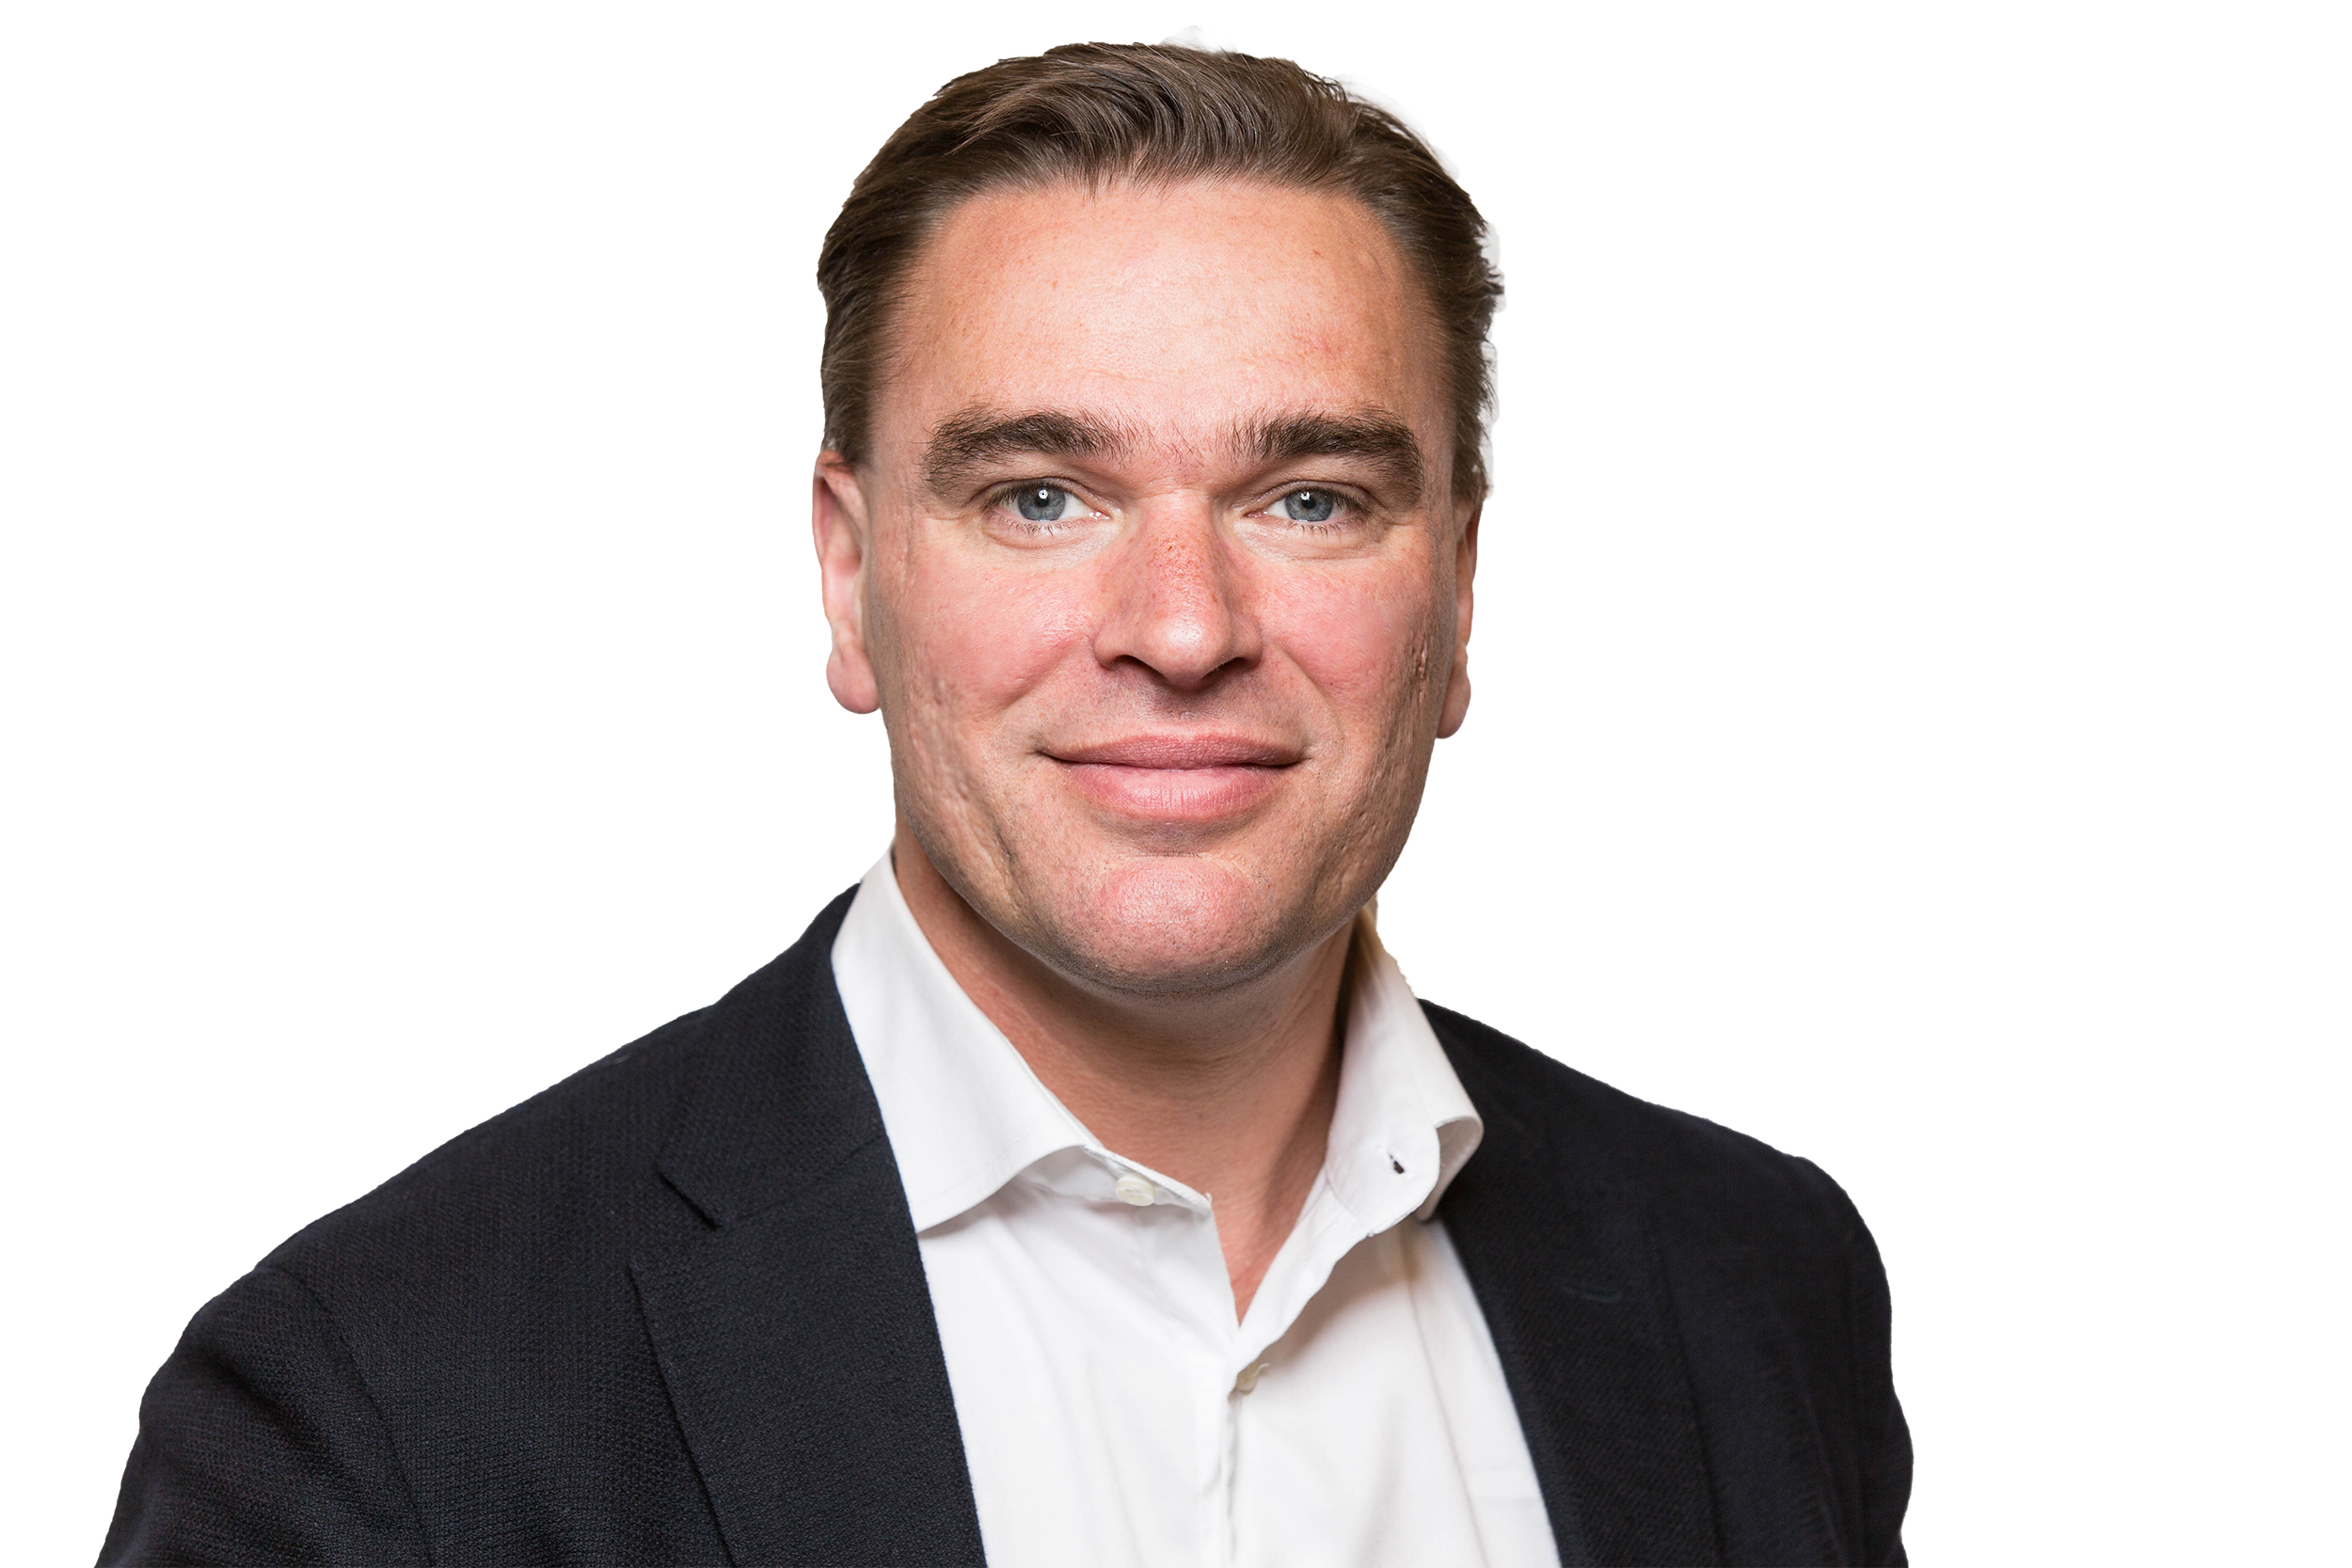 Tim van der Meer - Marktlink Fusies & Overnames